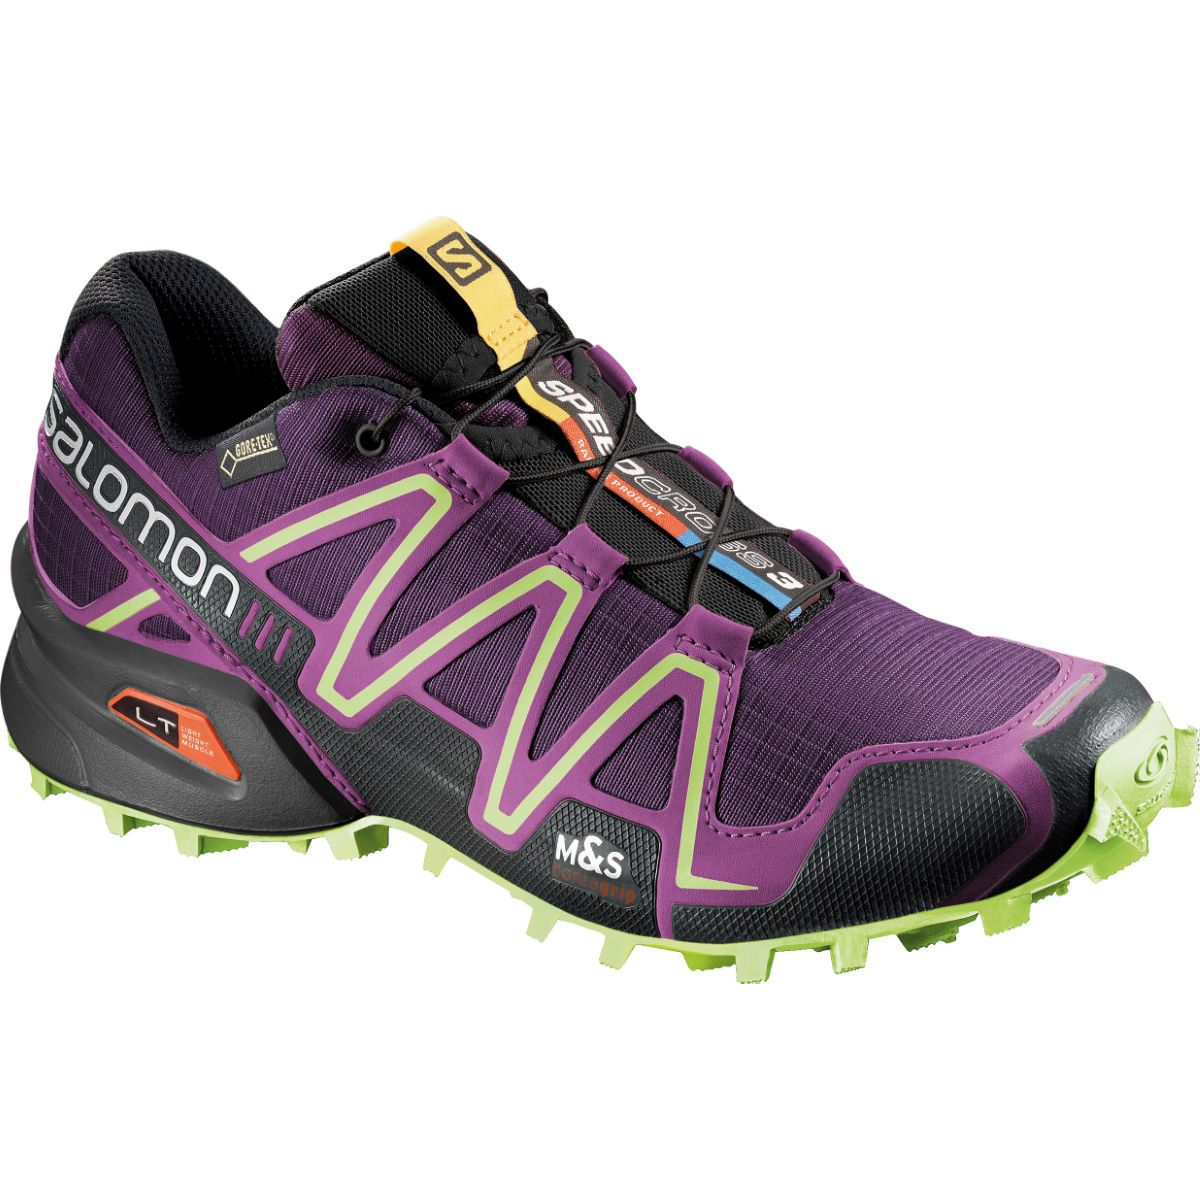 Salomon Speedcross 3 GTX Lady Purple/Black/Yellow Trail Running Shoessalomon xasalomon skis Colorful And Fashion Forward